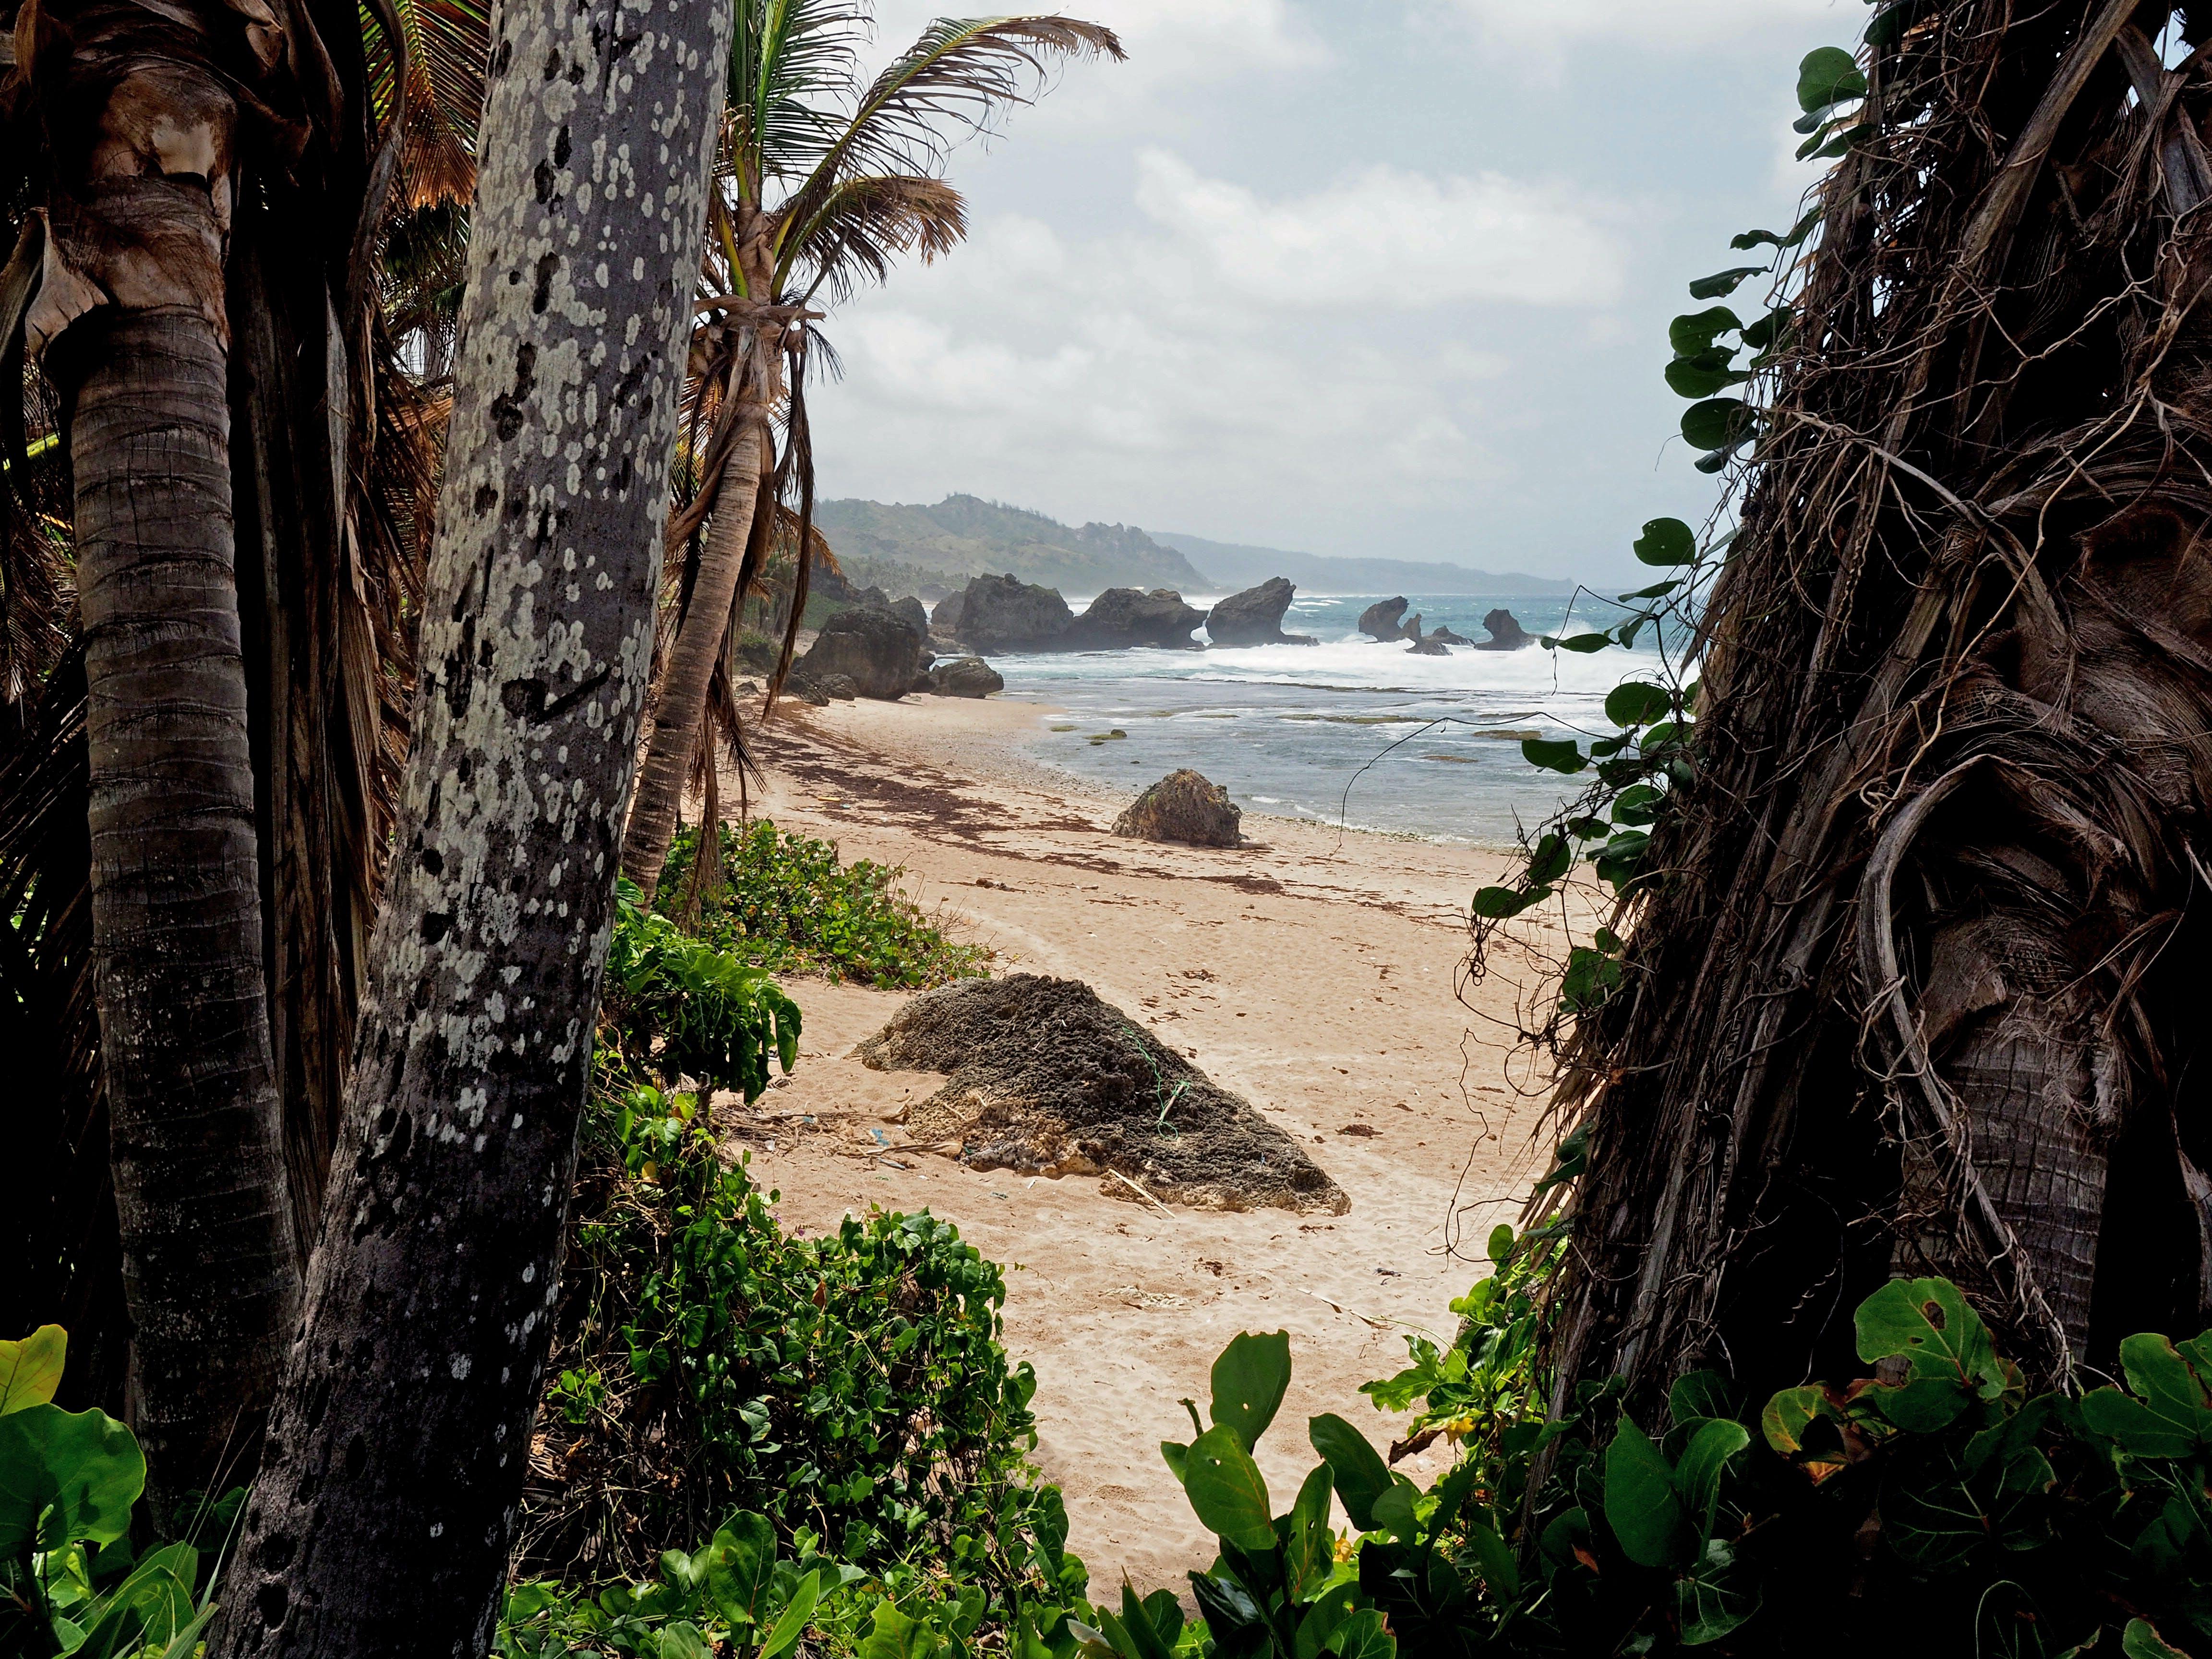 Free stock photo of beach, palm trees, travel, trees